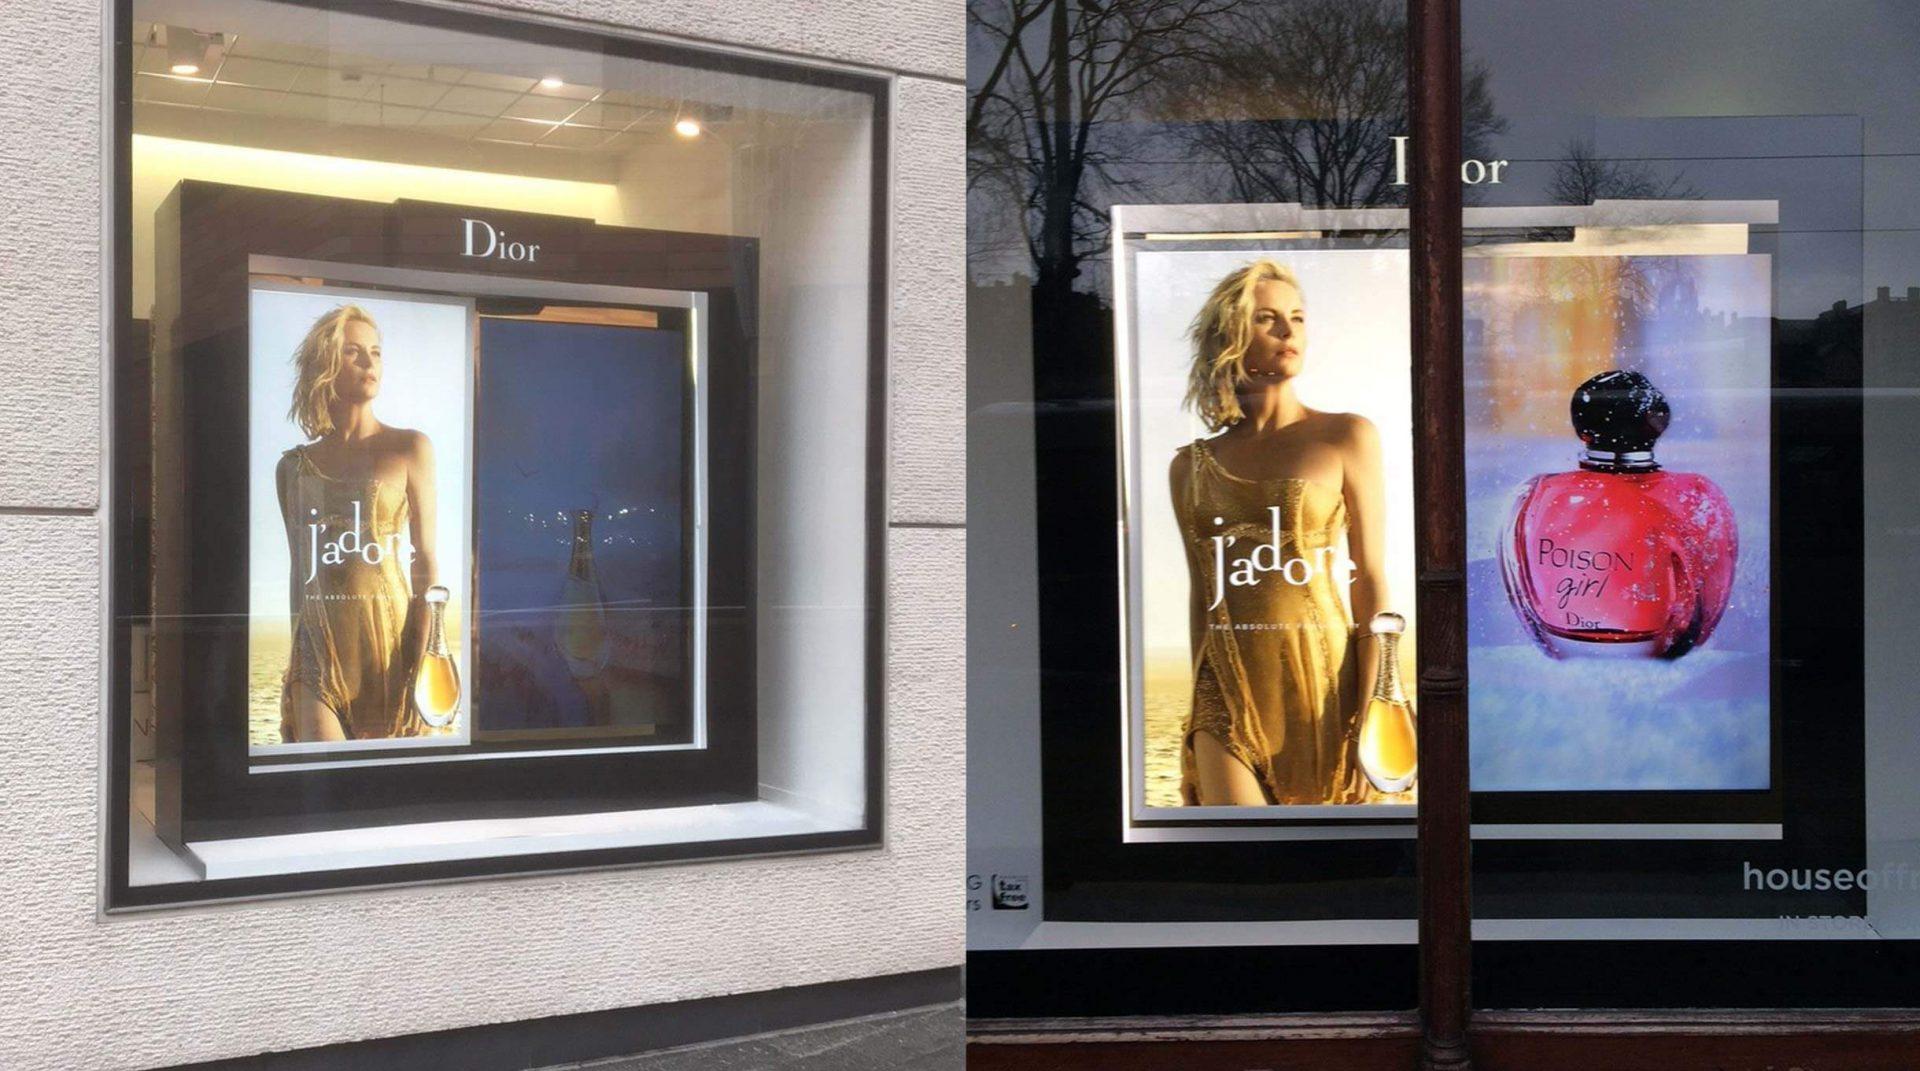 Dior J'ador Window Display